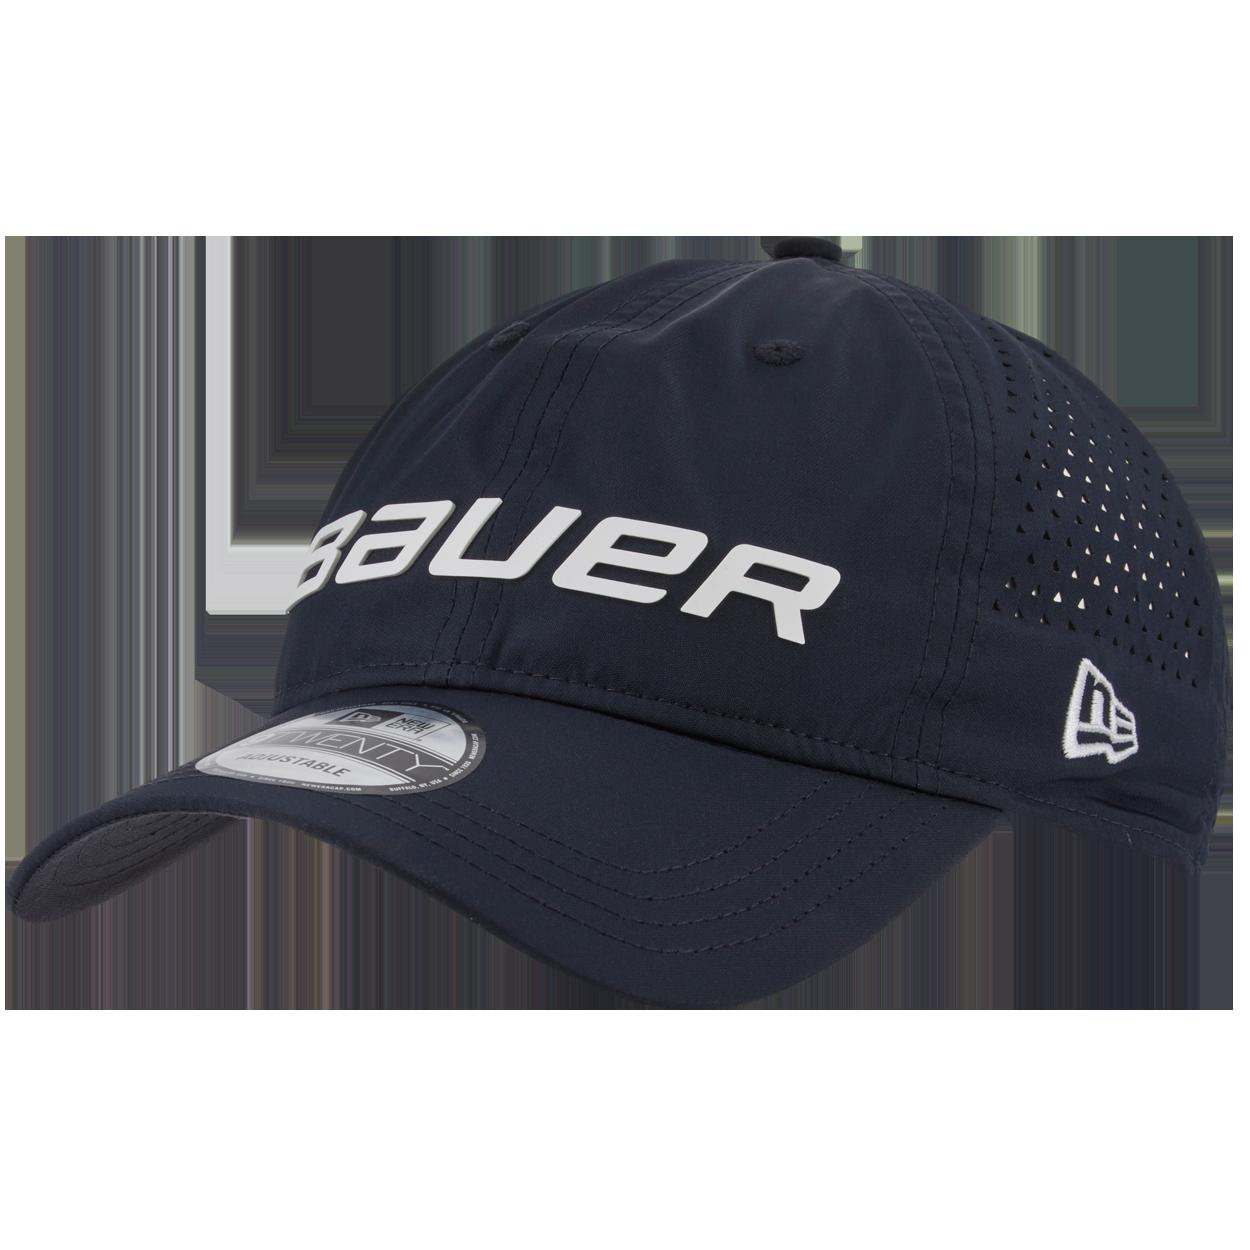 New Era 920 Adjustable Golf Hat